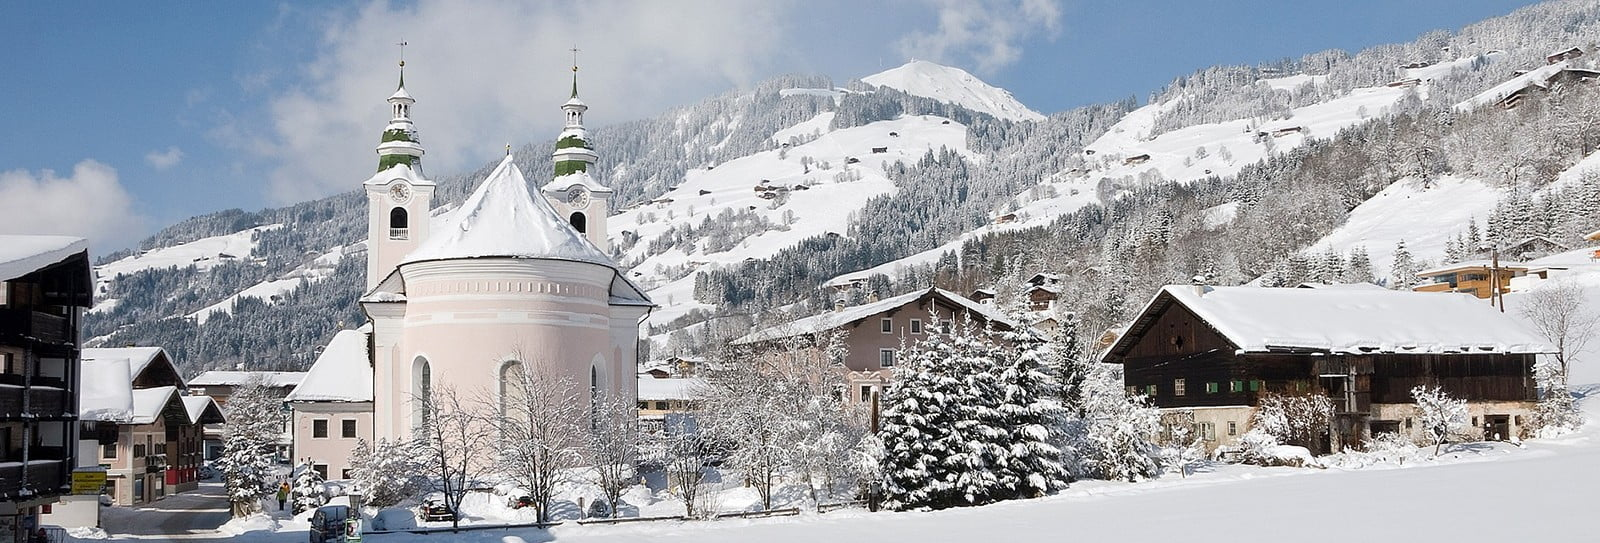 Brixen im Thale panorama